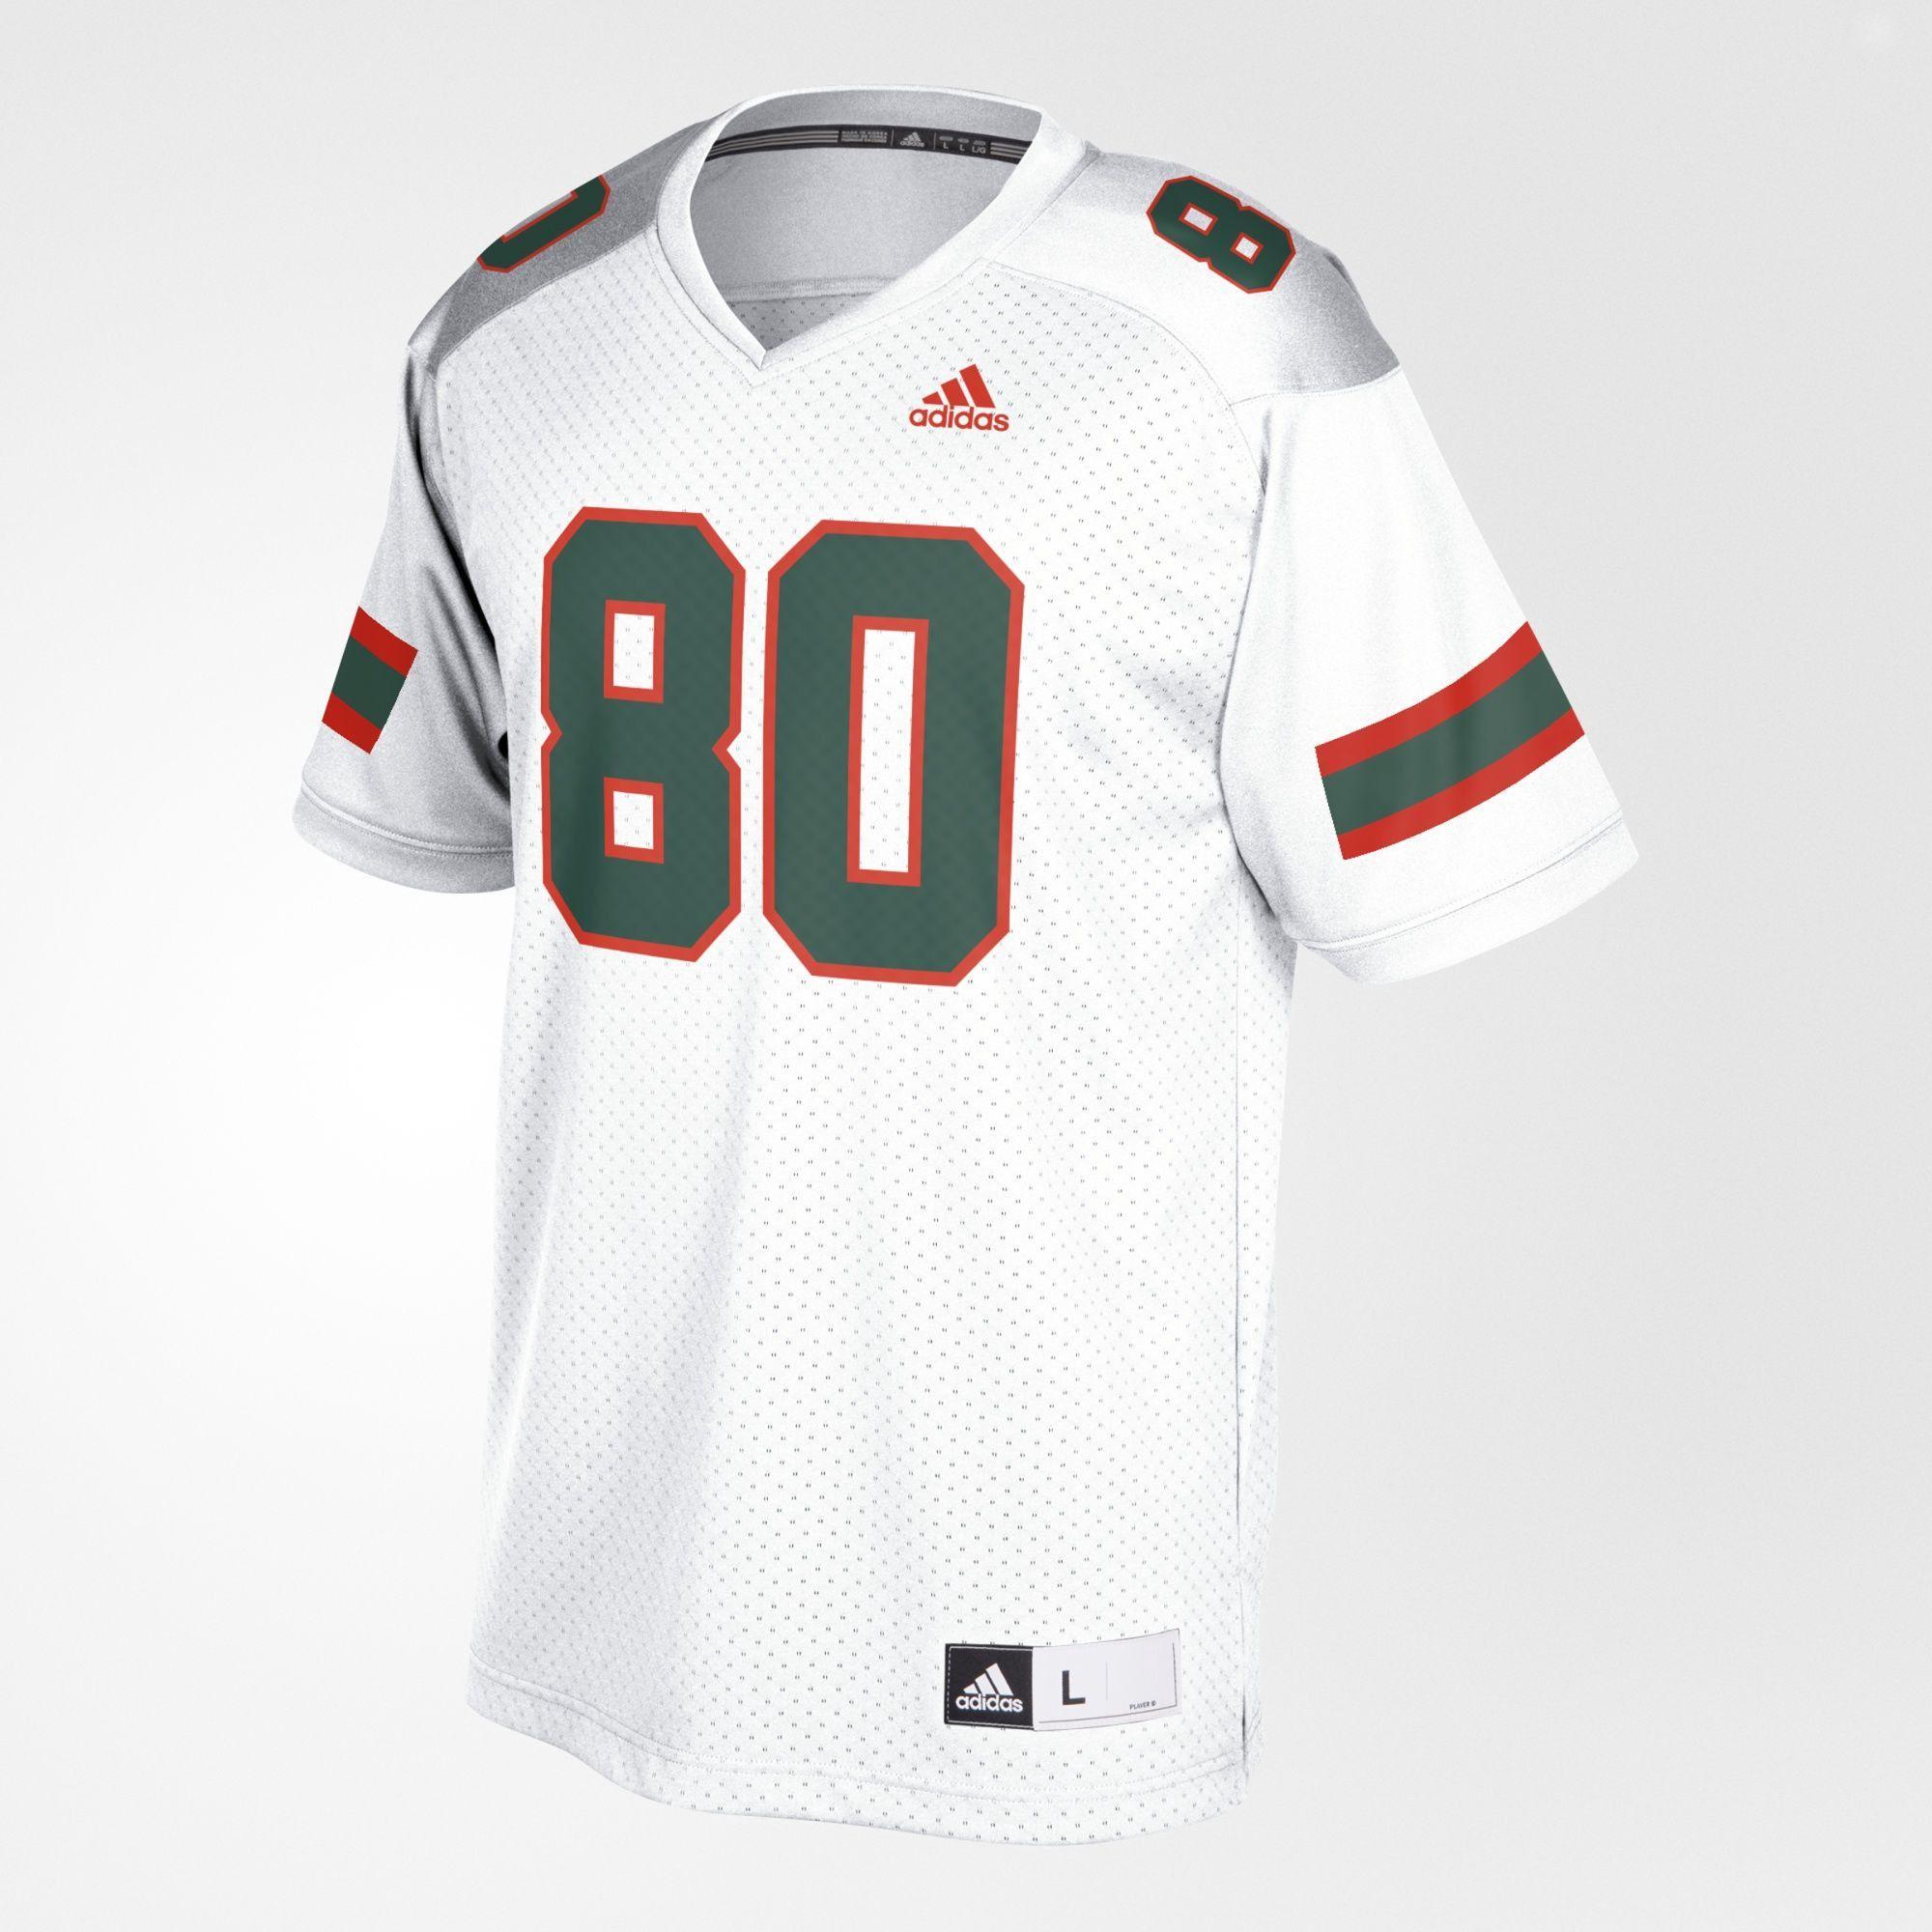 ADIDAS ORIGINALS Hurricanes Replica Football Jersey.  adidasoriginals   cloth   449b2450c